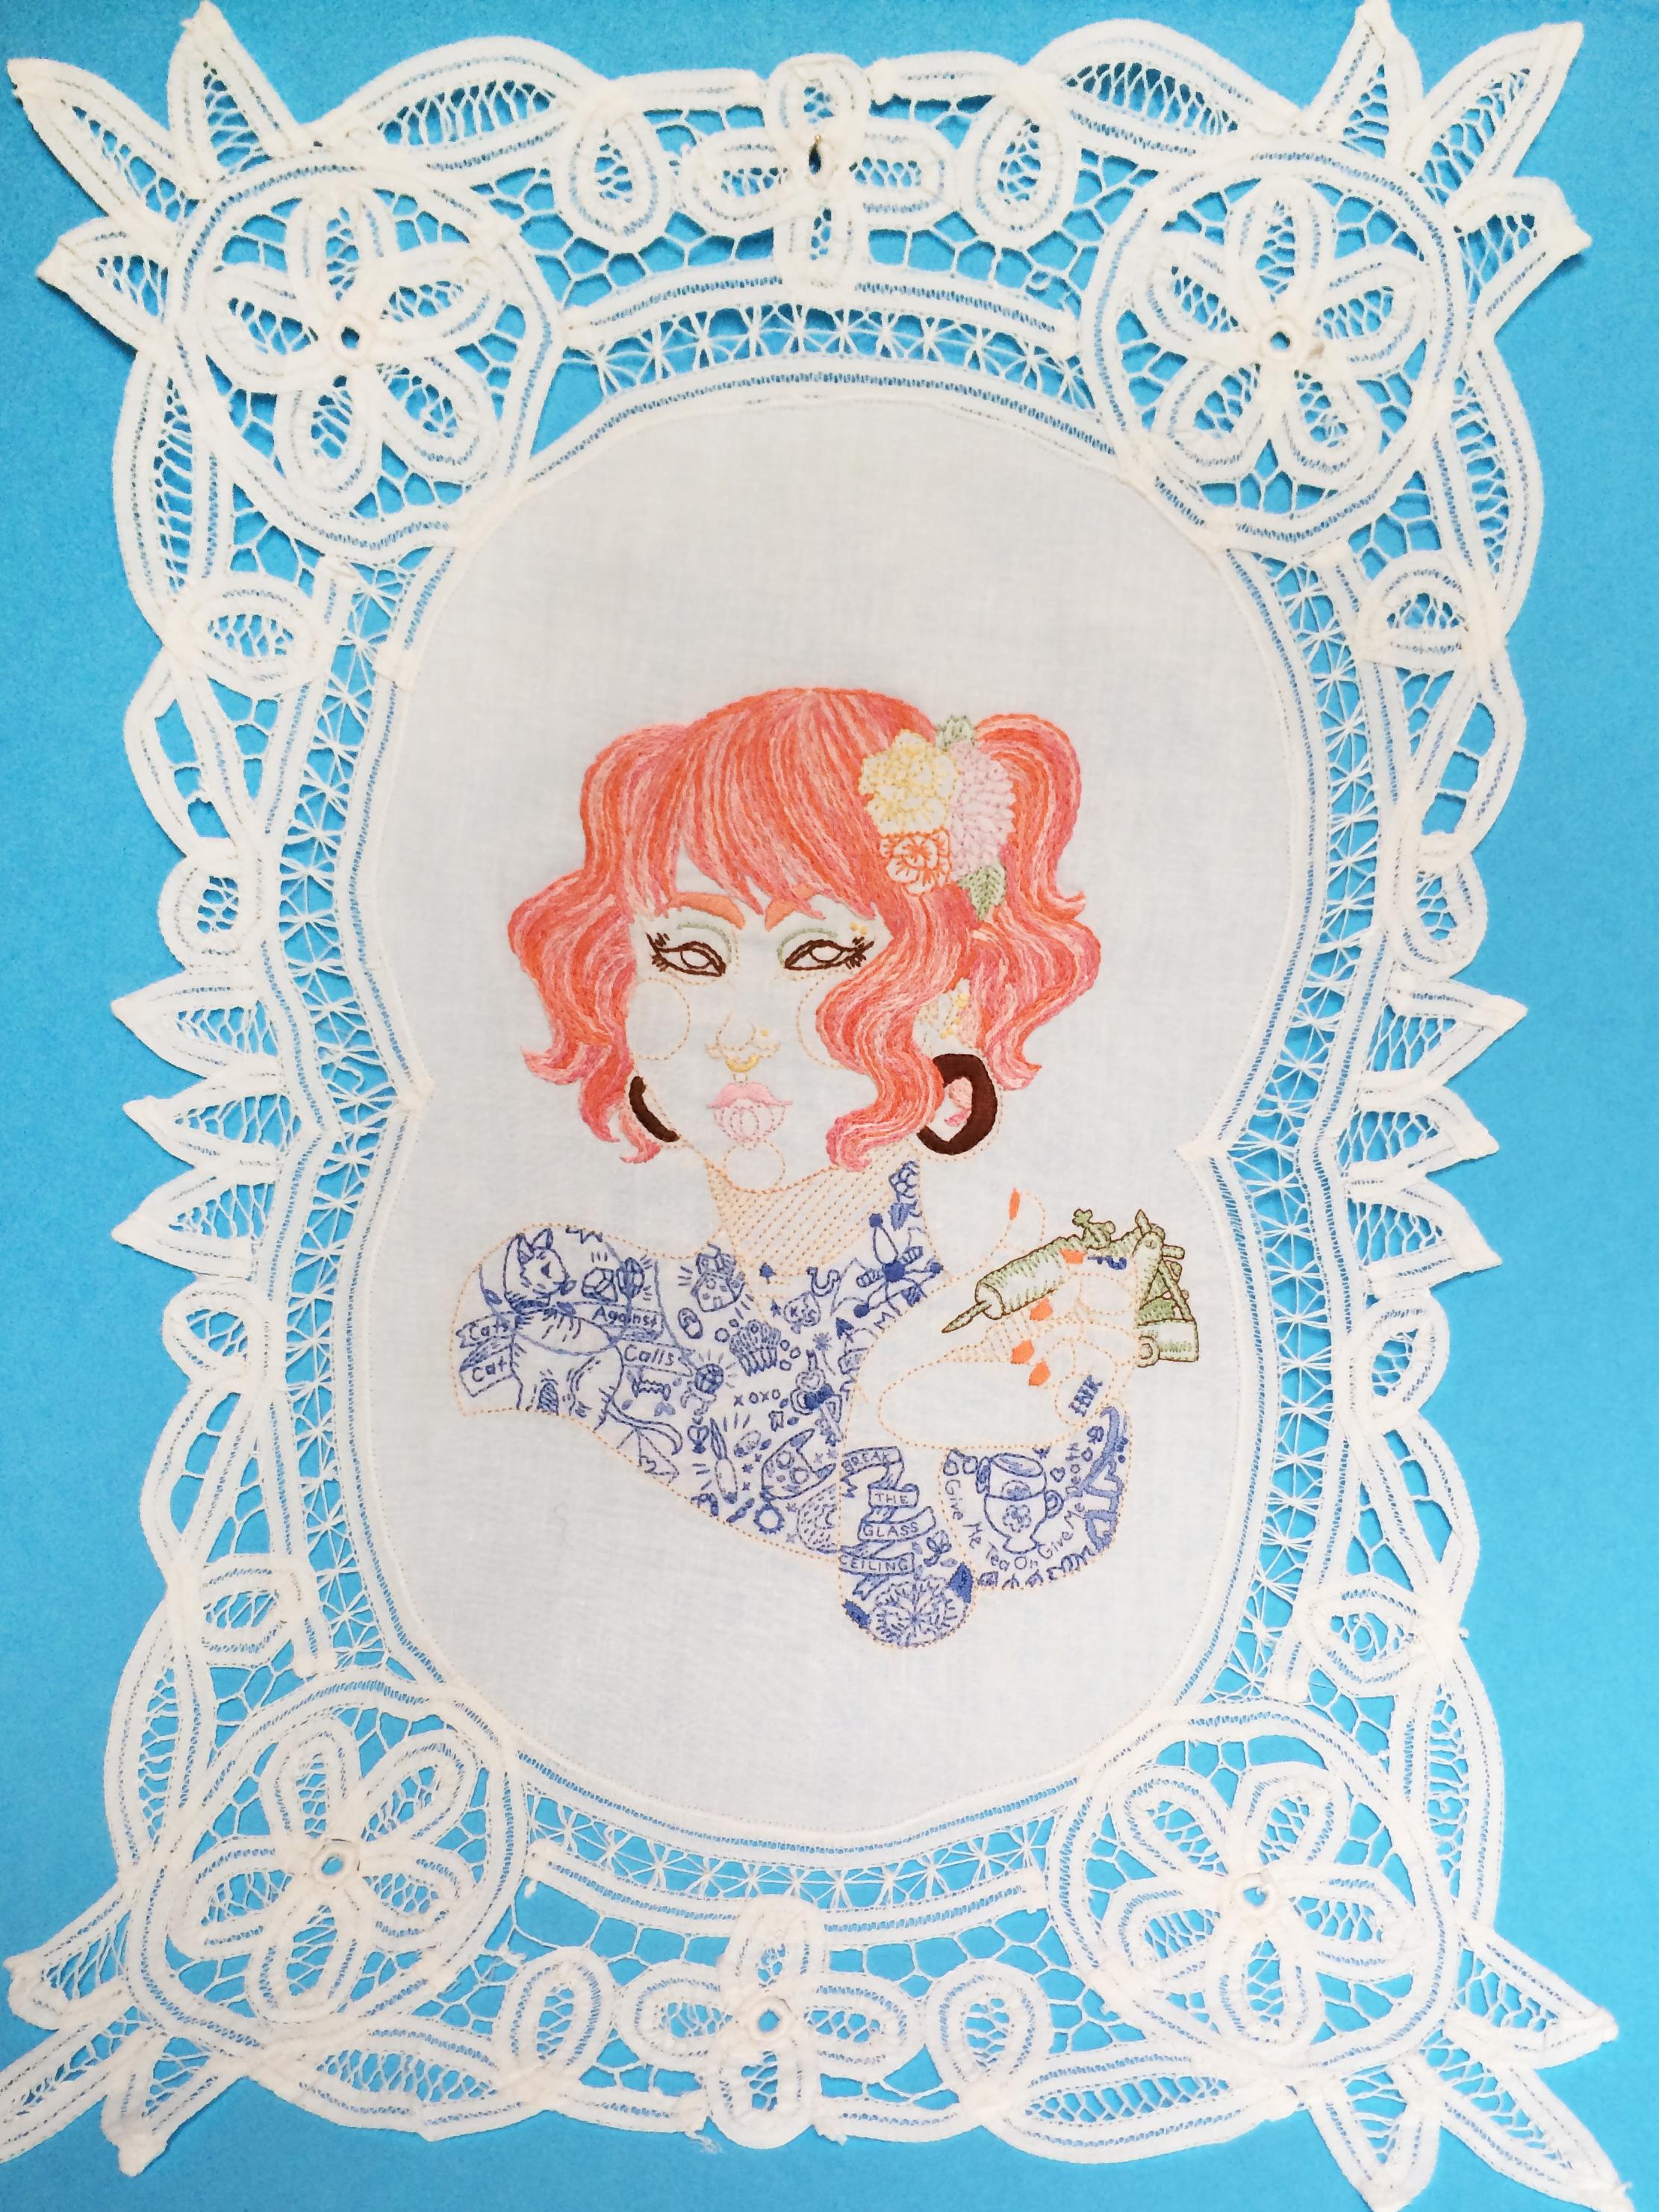 "Sophomore,   Embroidered Illustration on Vintage Lace. 20""x14""  . 2015."